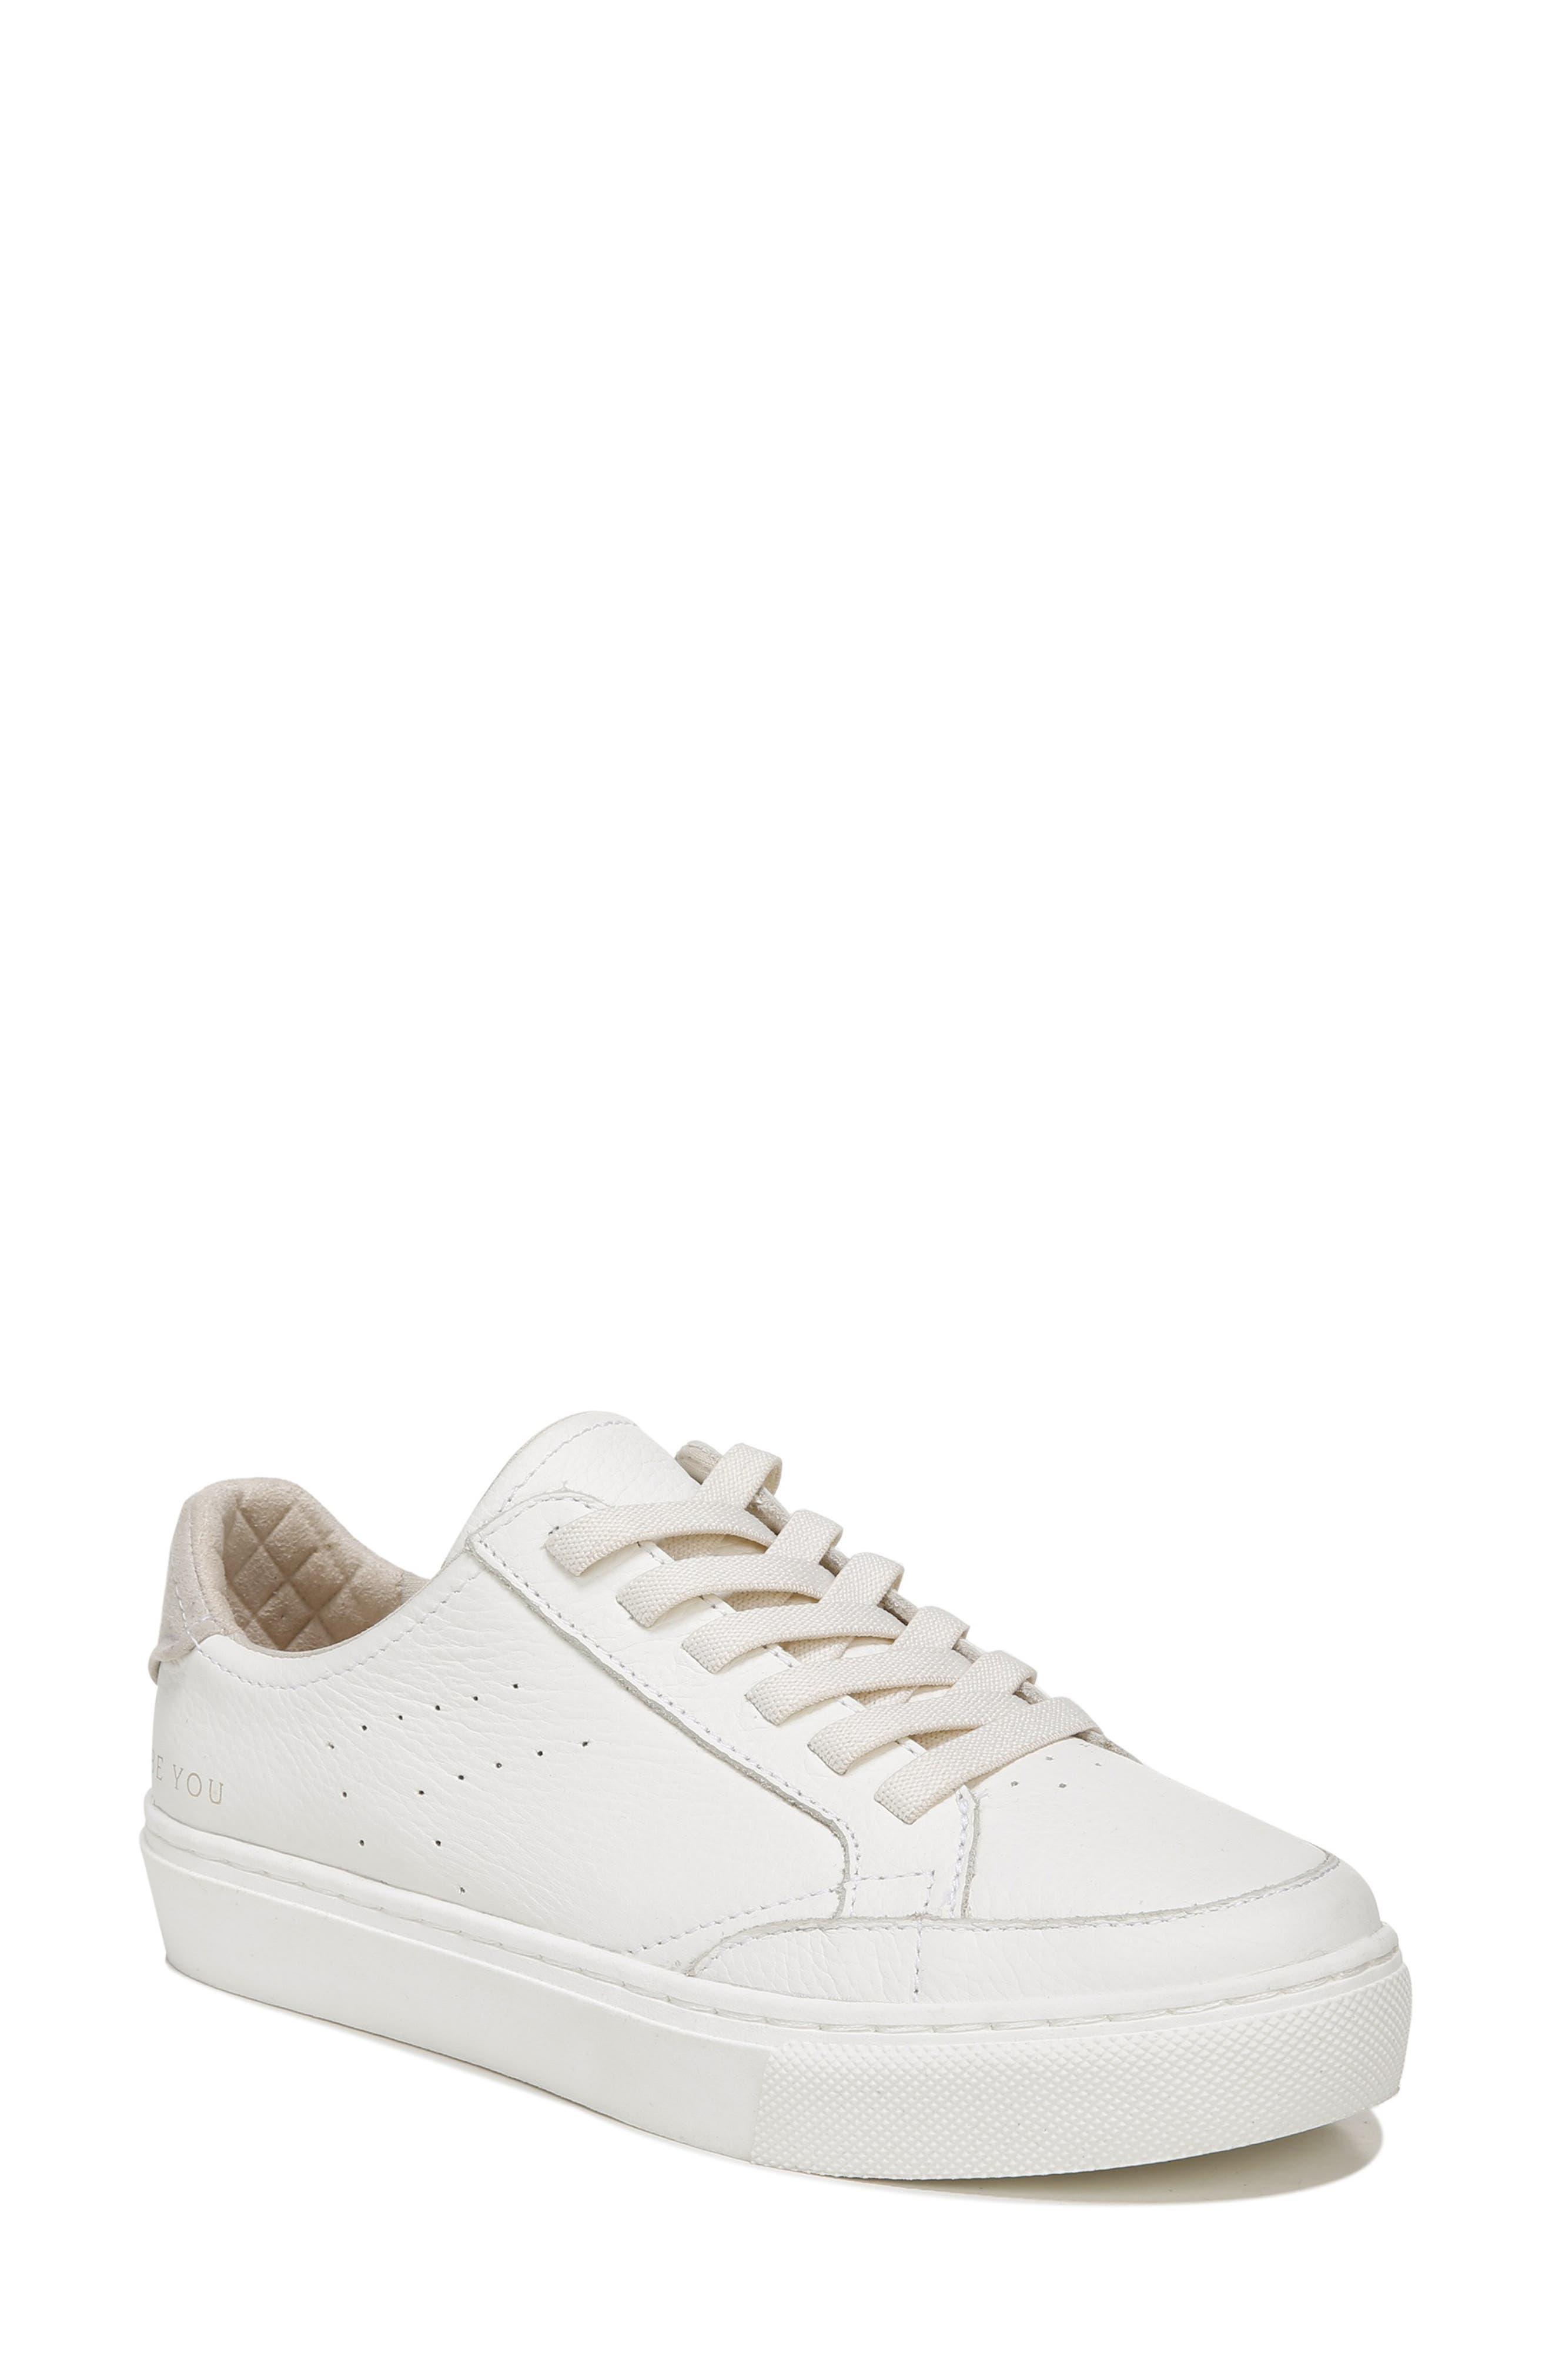 All In Go Platform Sneaker